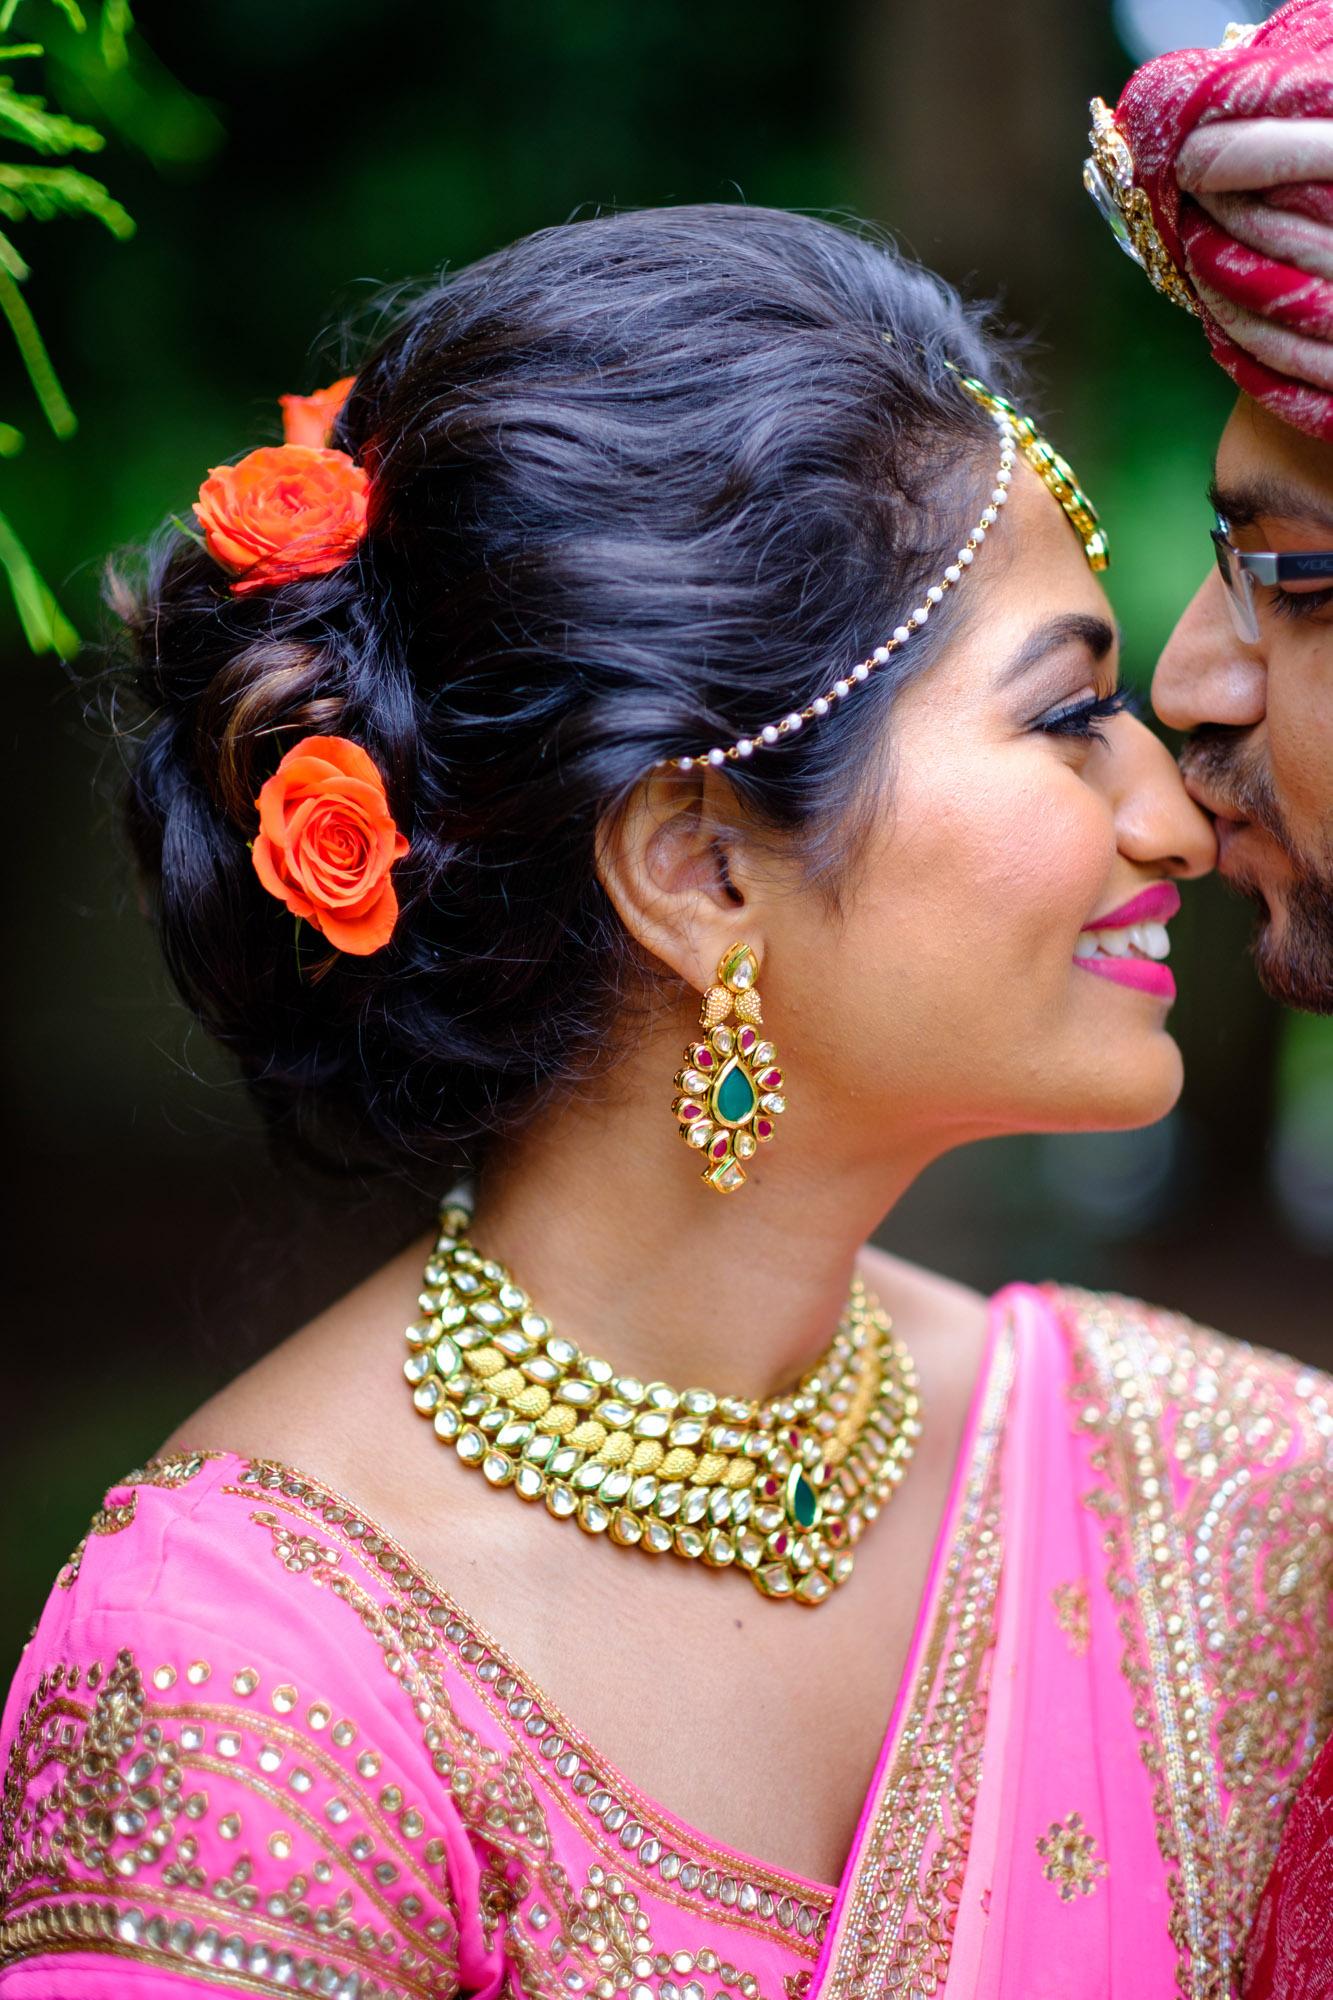 malika & nadir woodsgate stroudsmoor wedding 31